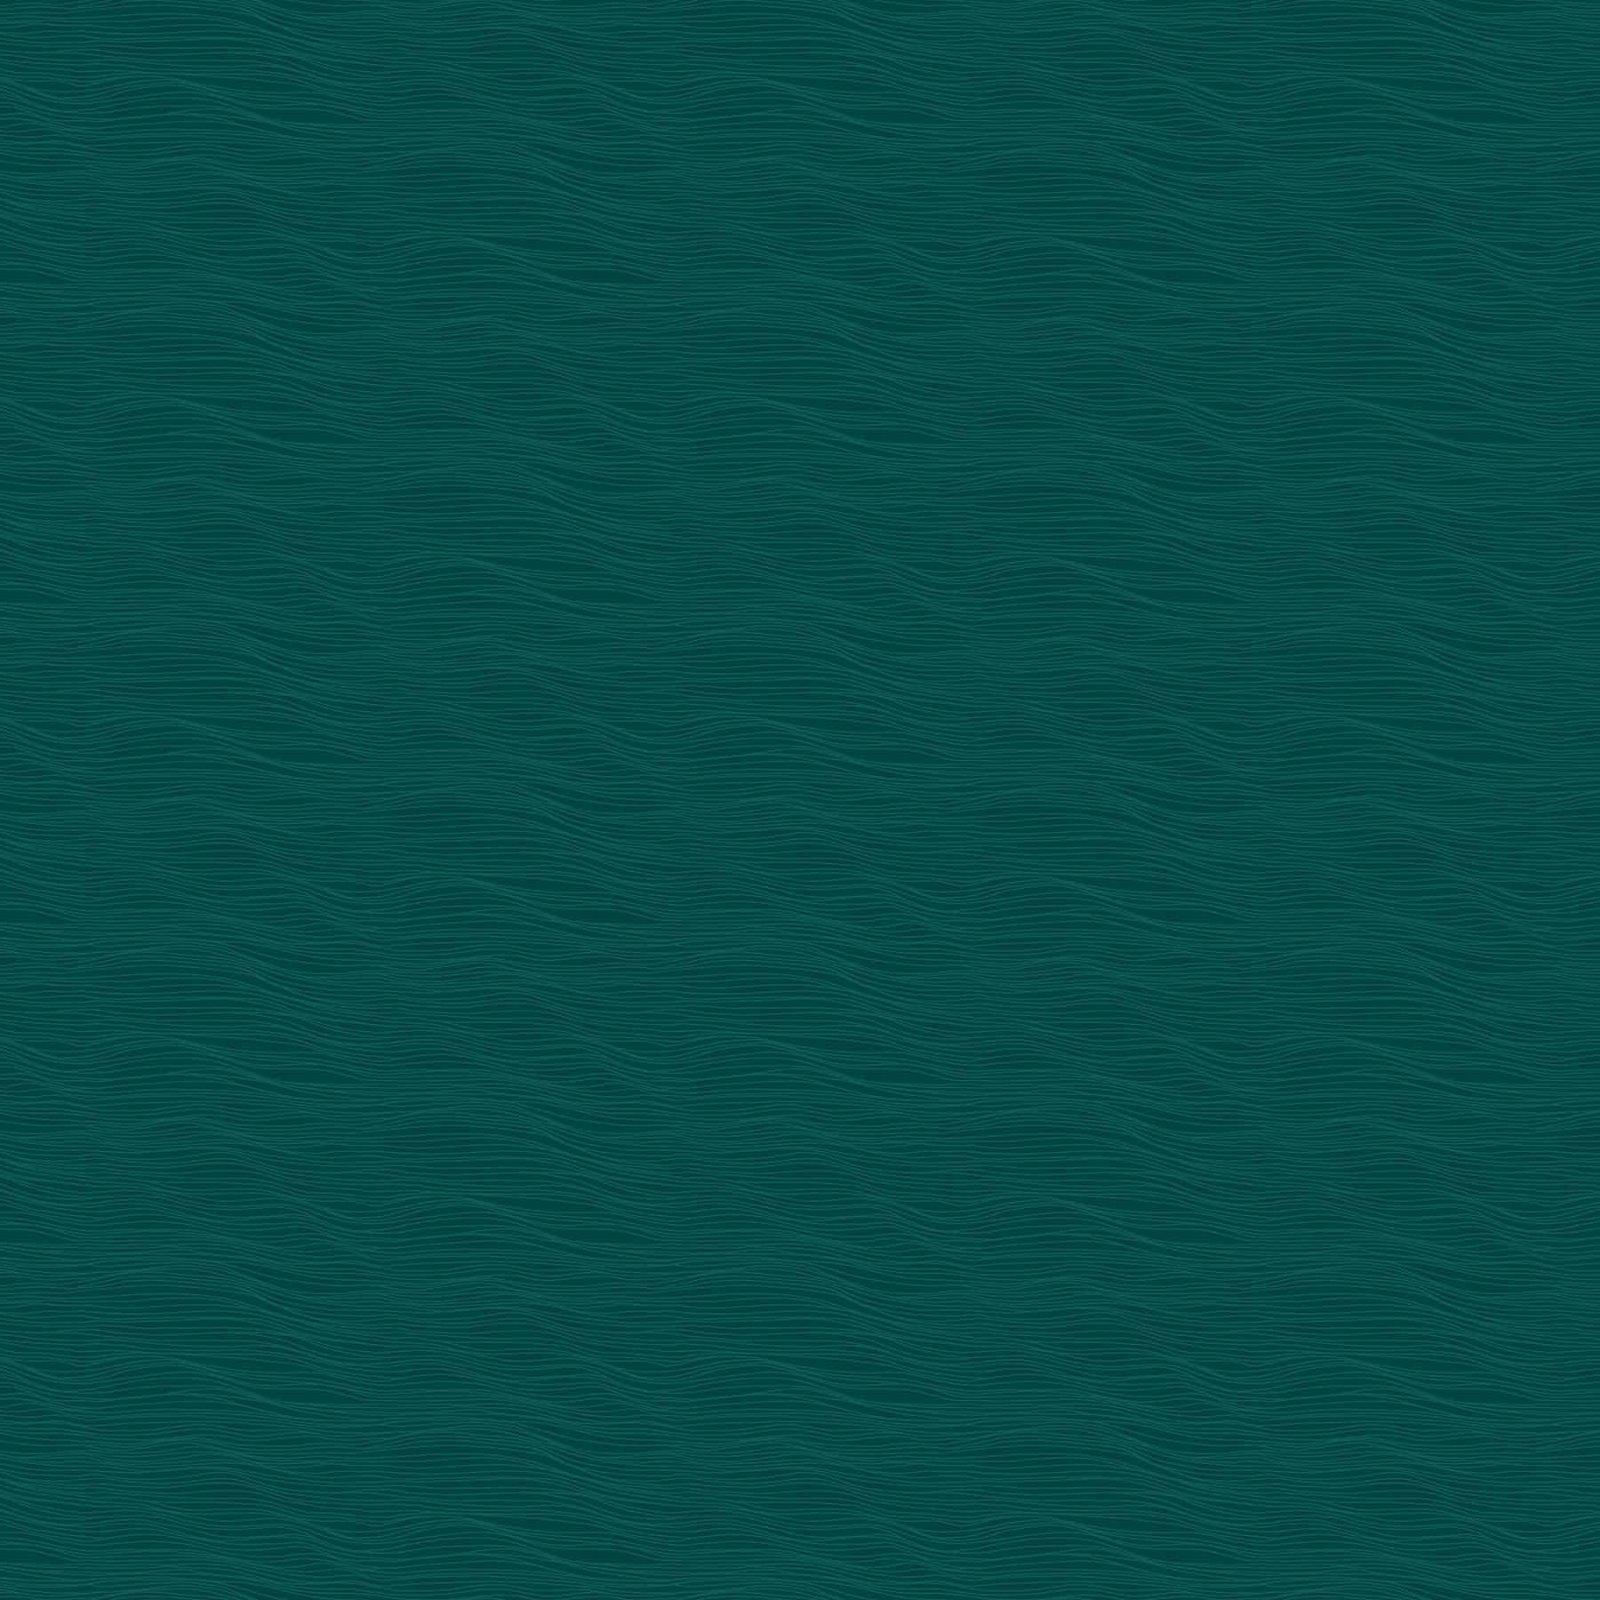 Elements by Ghazal Razavi - Water - Jade